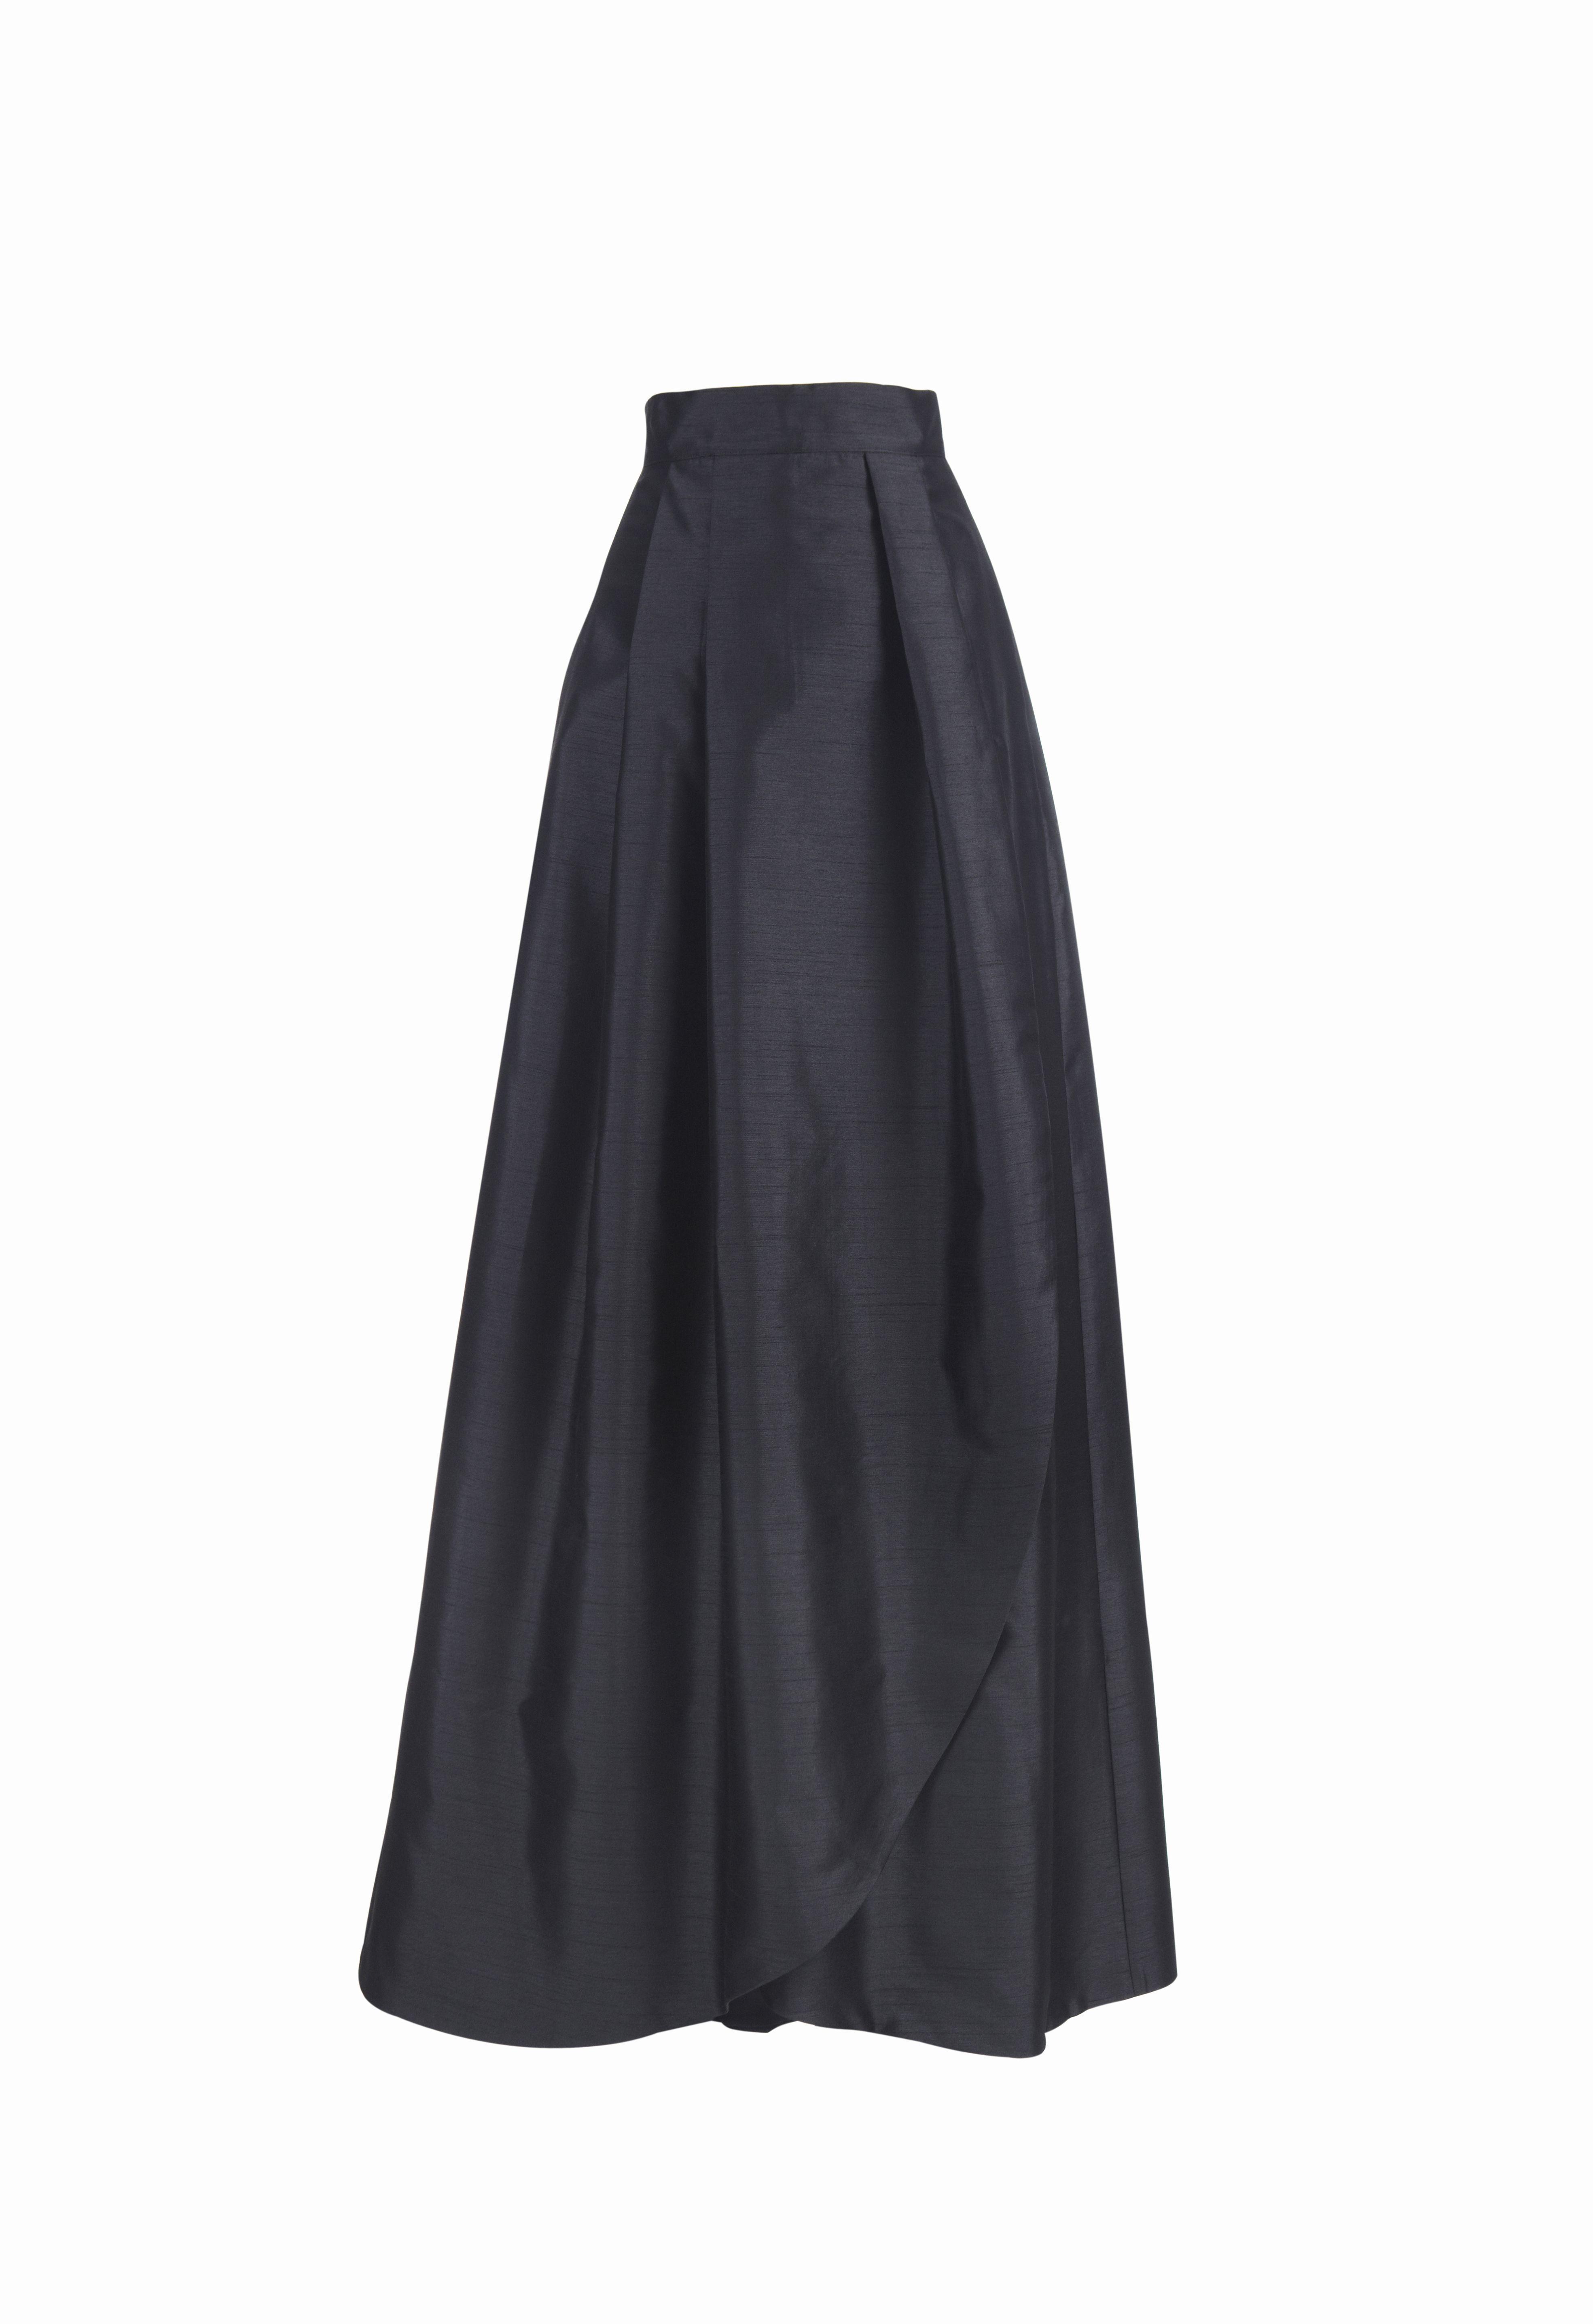 506a55d39 Falda larga Victoria negra Miticca by Isabella Gobarodi | Faldas en ...